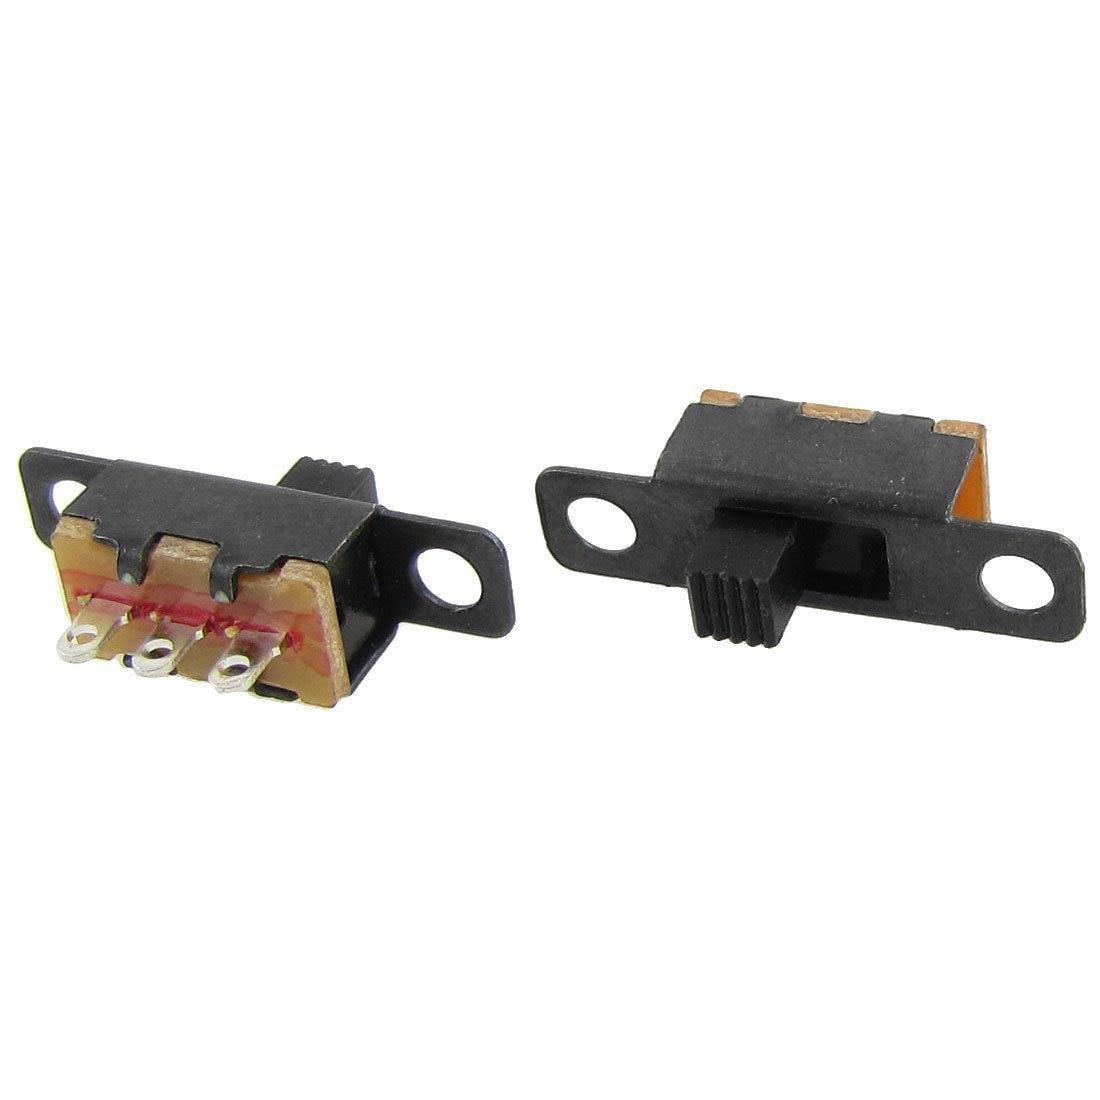 50 pces on/on 2 posição 1p2t spdt mini painel interruptor deslizante solda lug SS12F1-G3